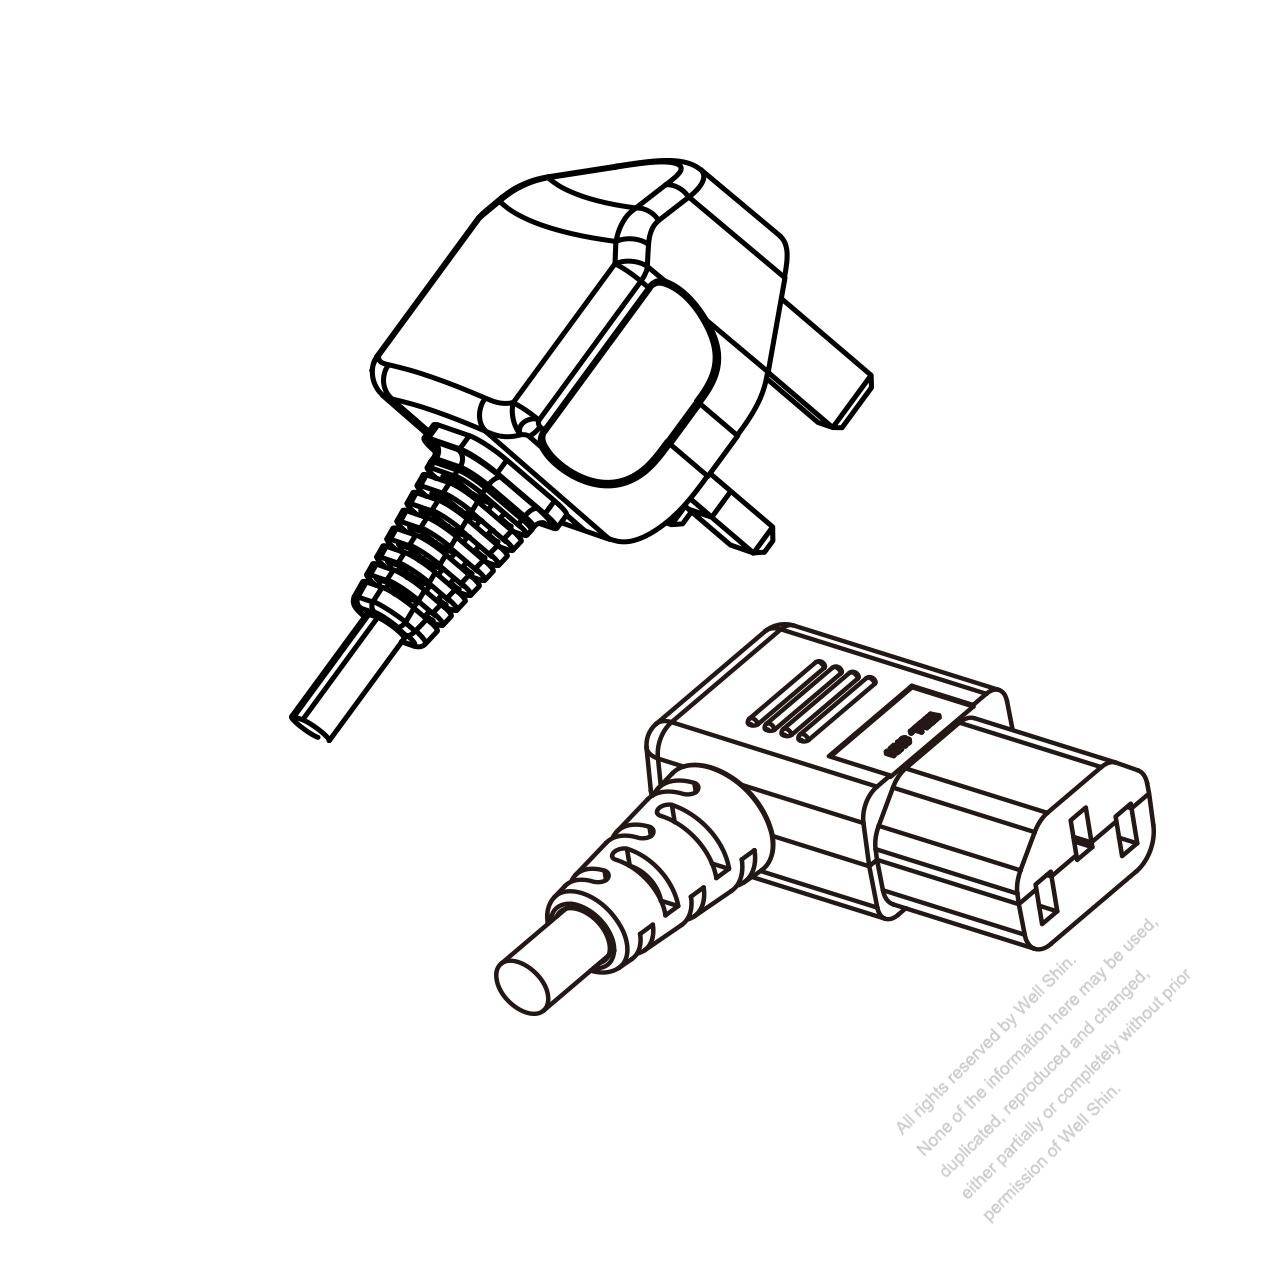 uk 3-pin plug to iec 320 c13 right angle power cord set  hf